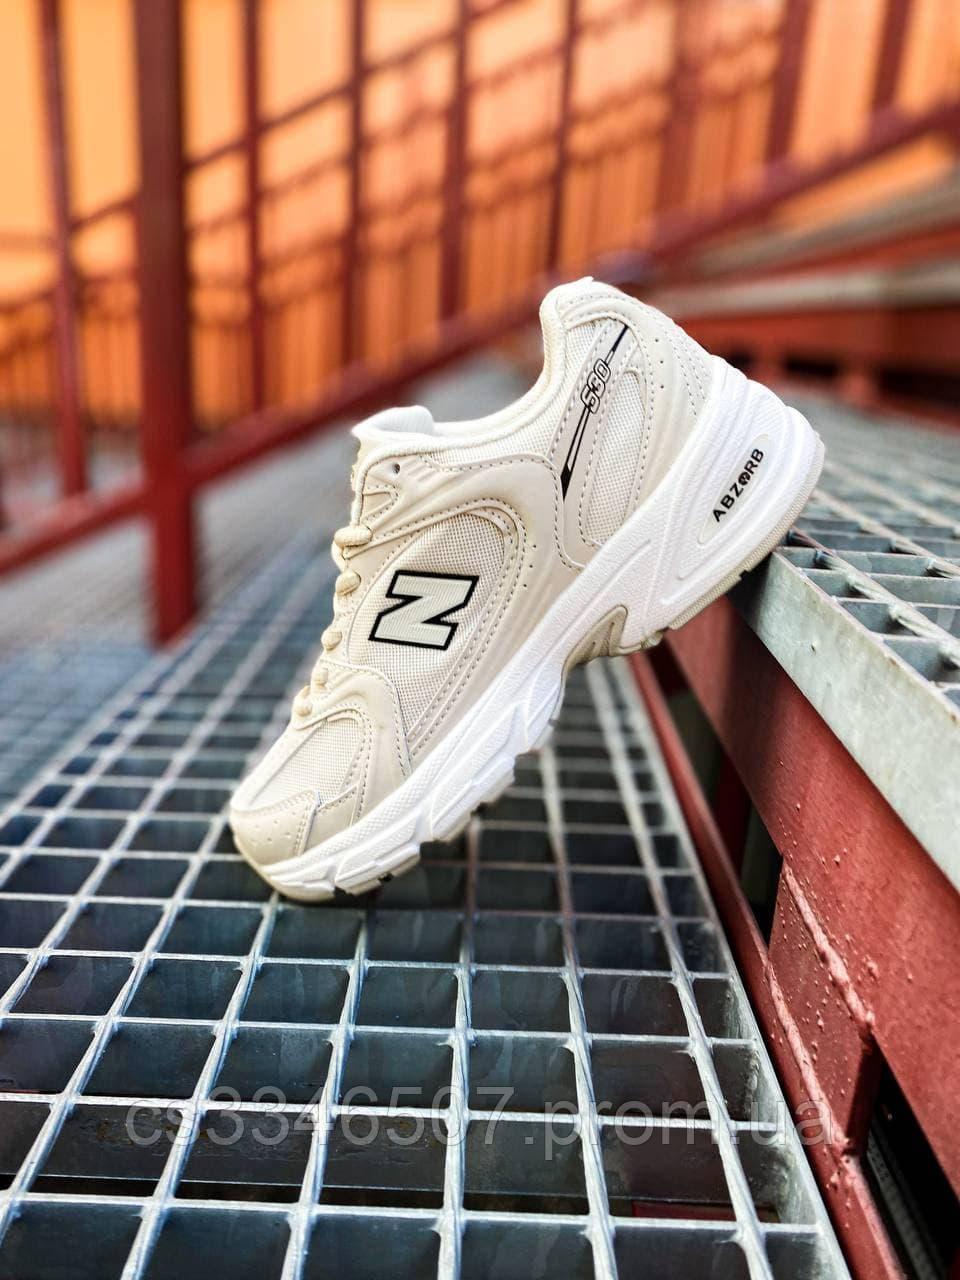 "🔥New Balance 530 White/Cream"" (Топ якість) 🔥"